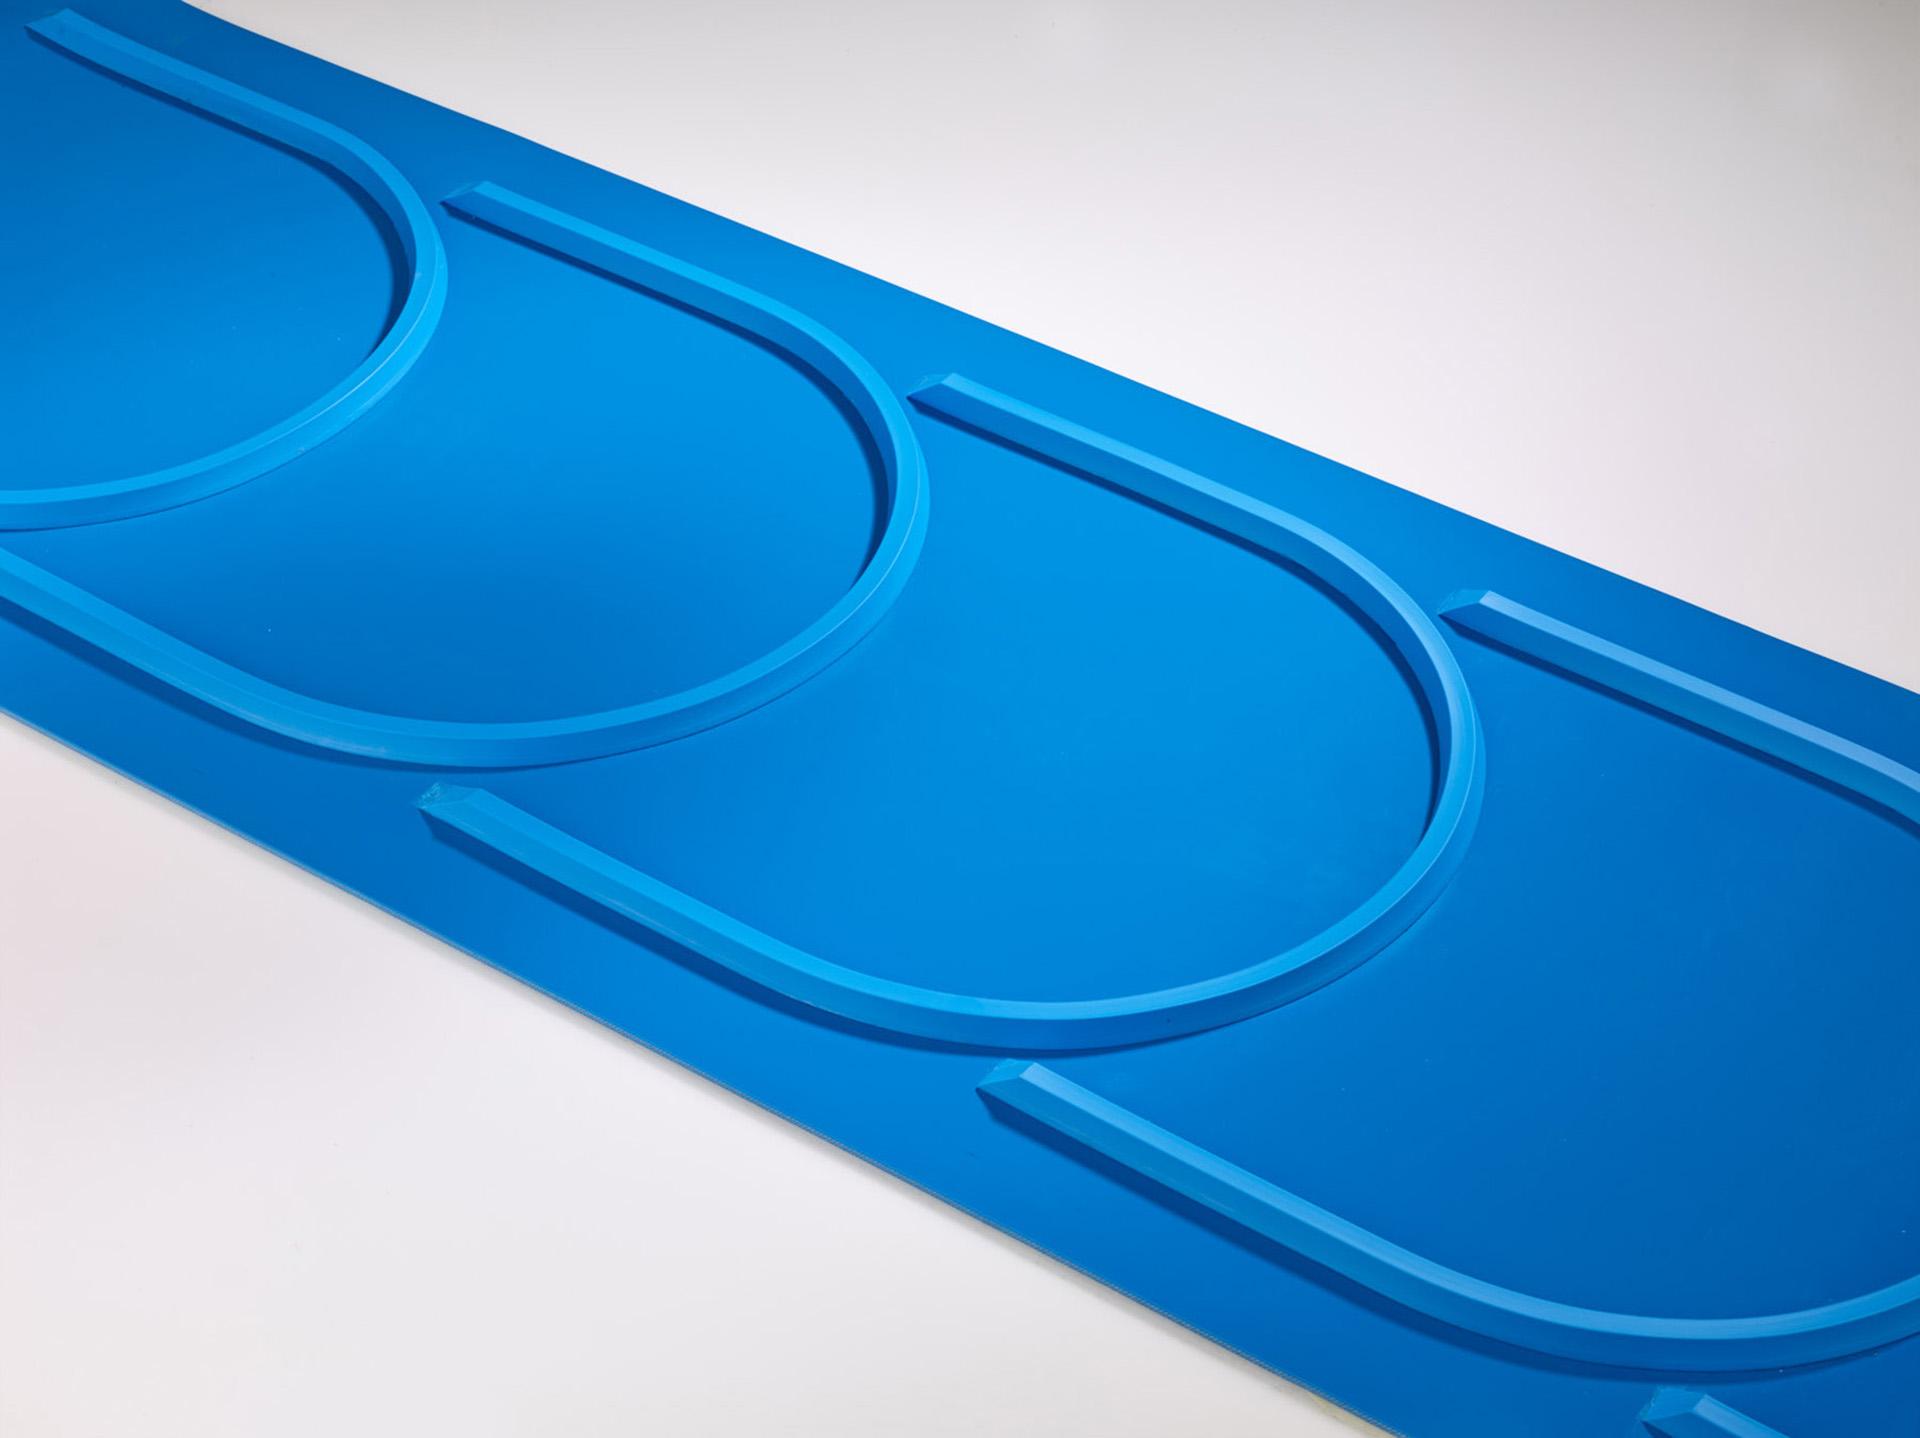 Fotodesign-Matthias-Schütz-transportband-blau